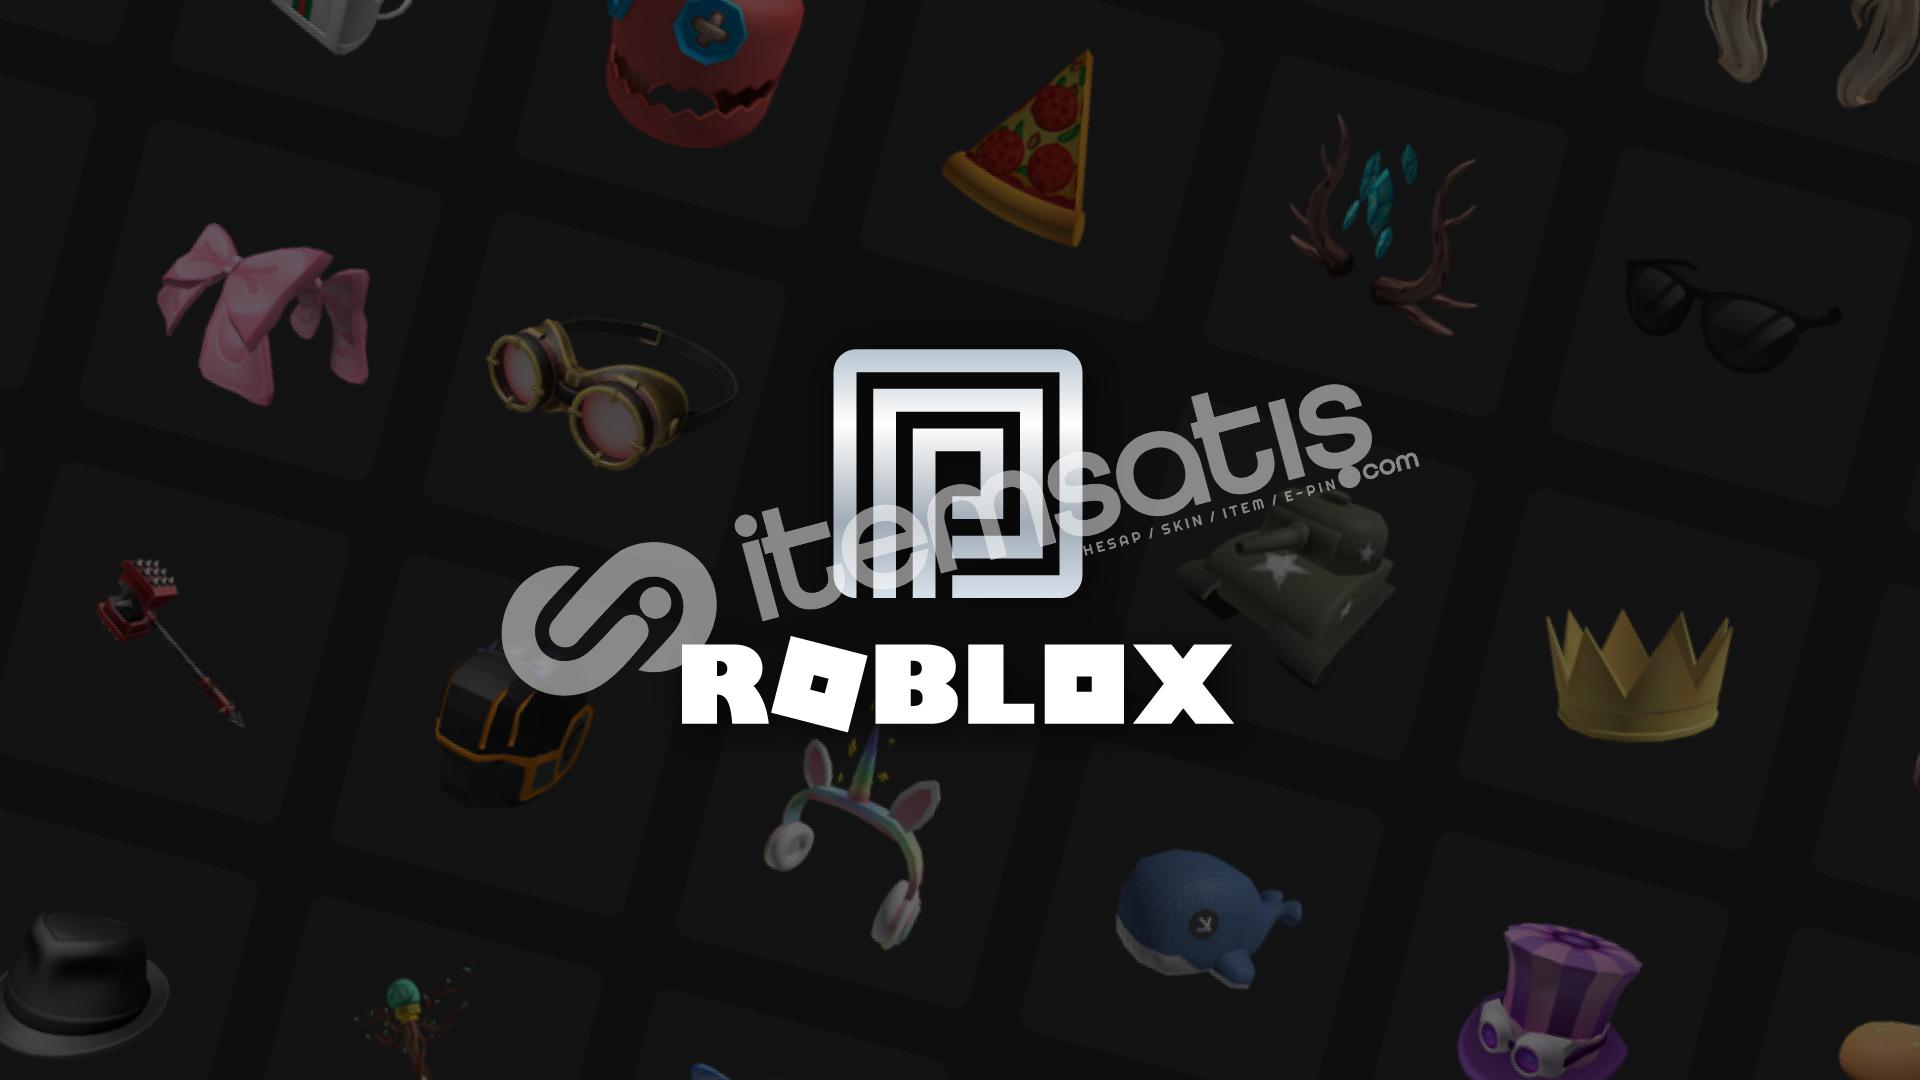 Roblox 1600 Robux (İndirimli)